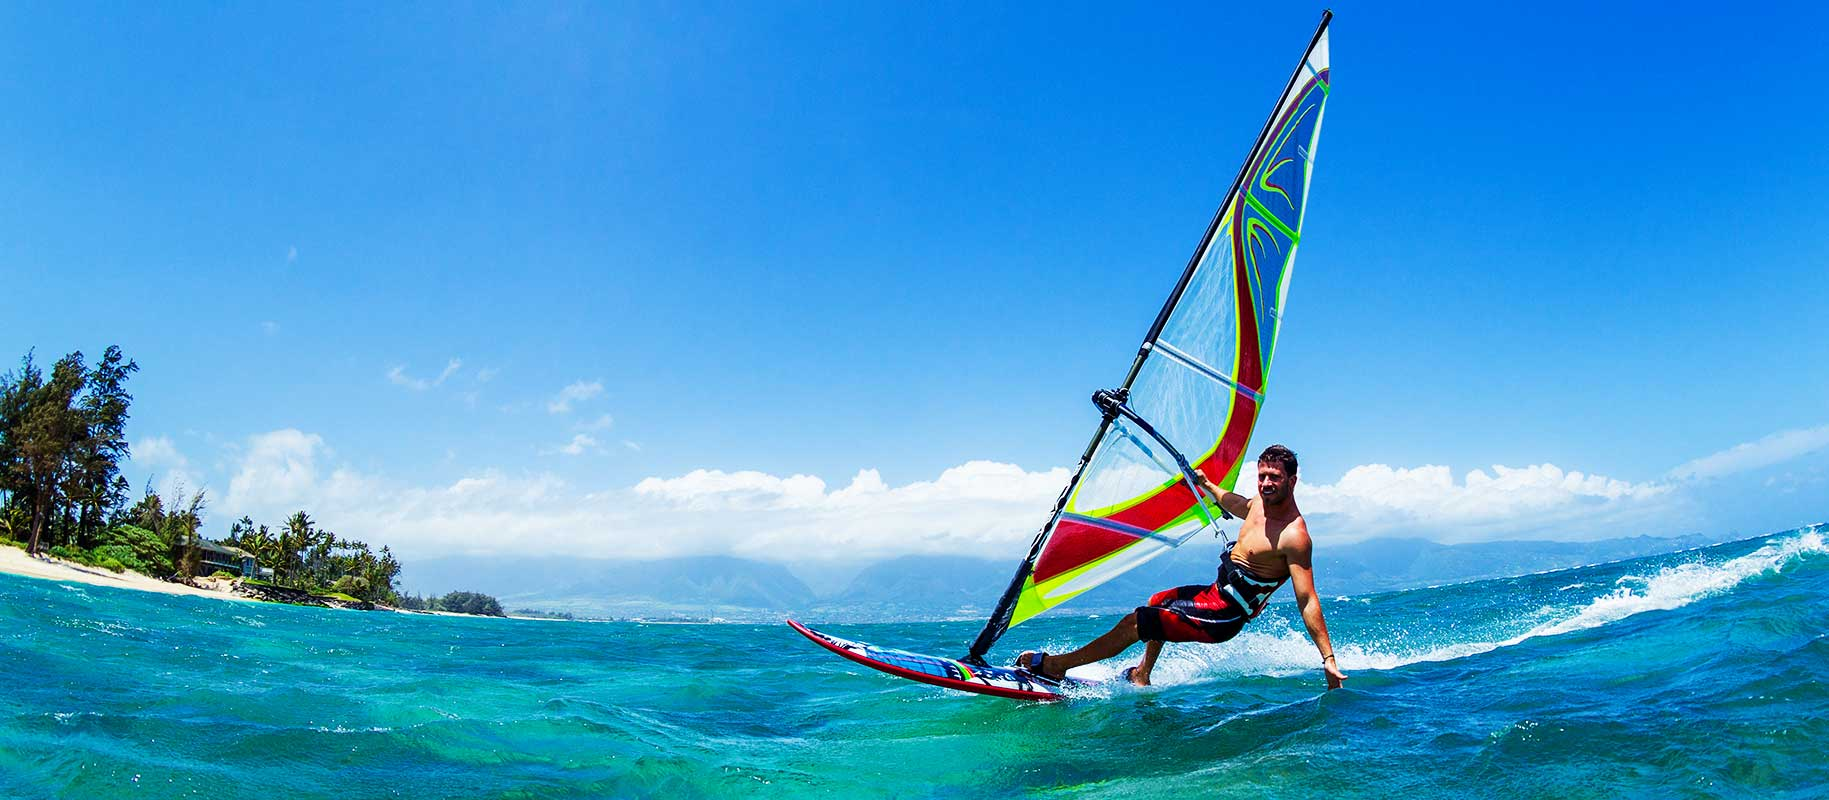 Windsurfing-body